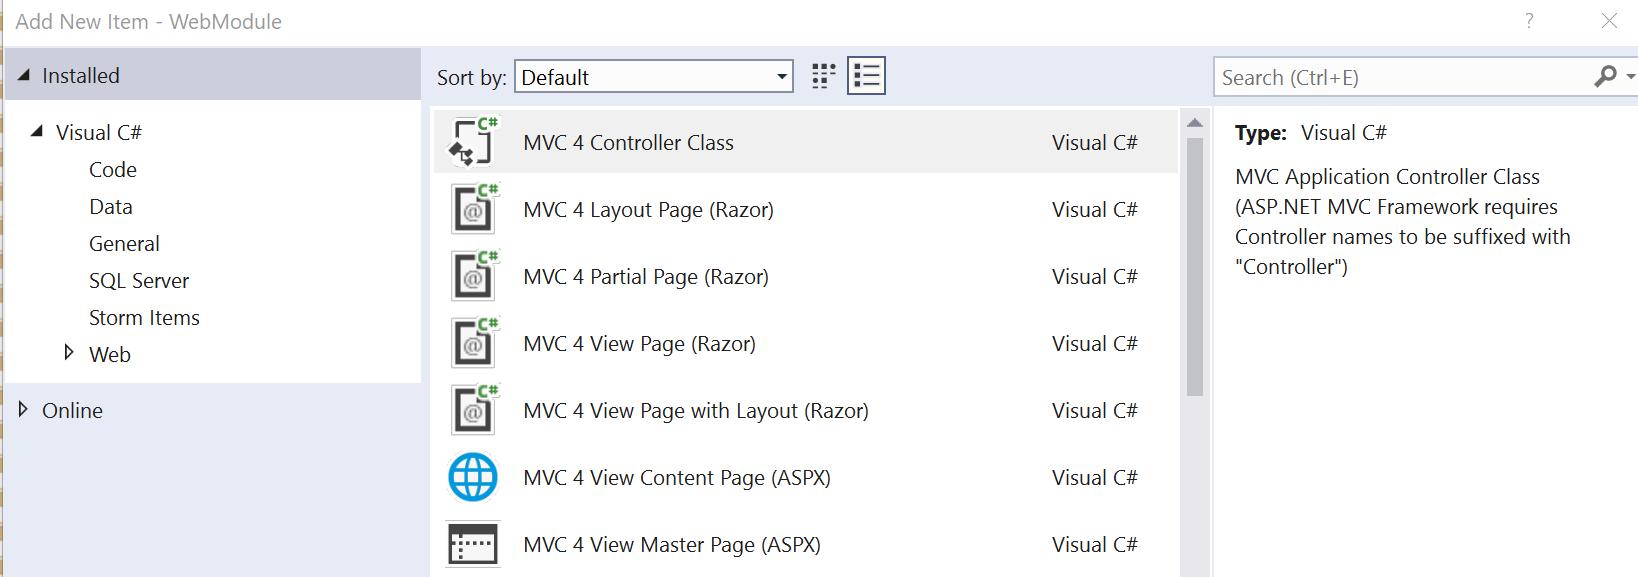 Add new item dialog in visual studio